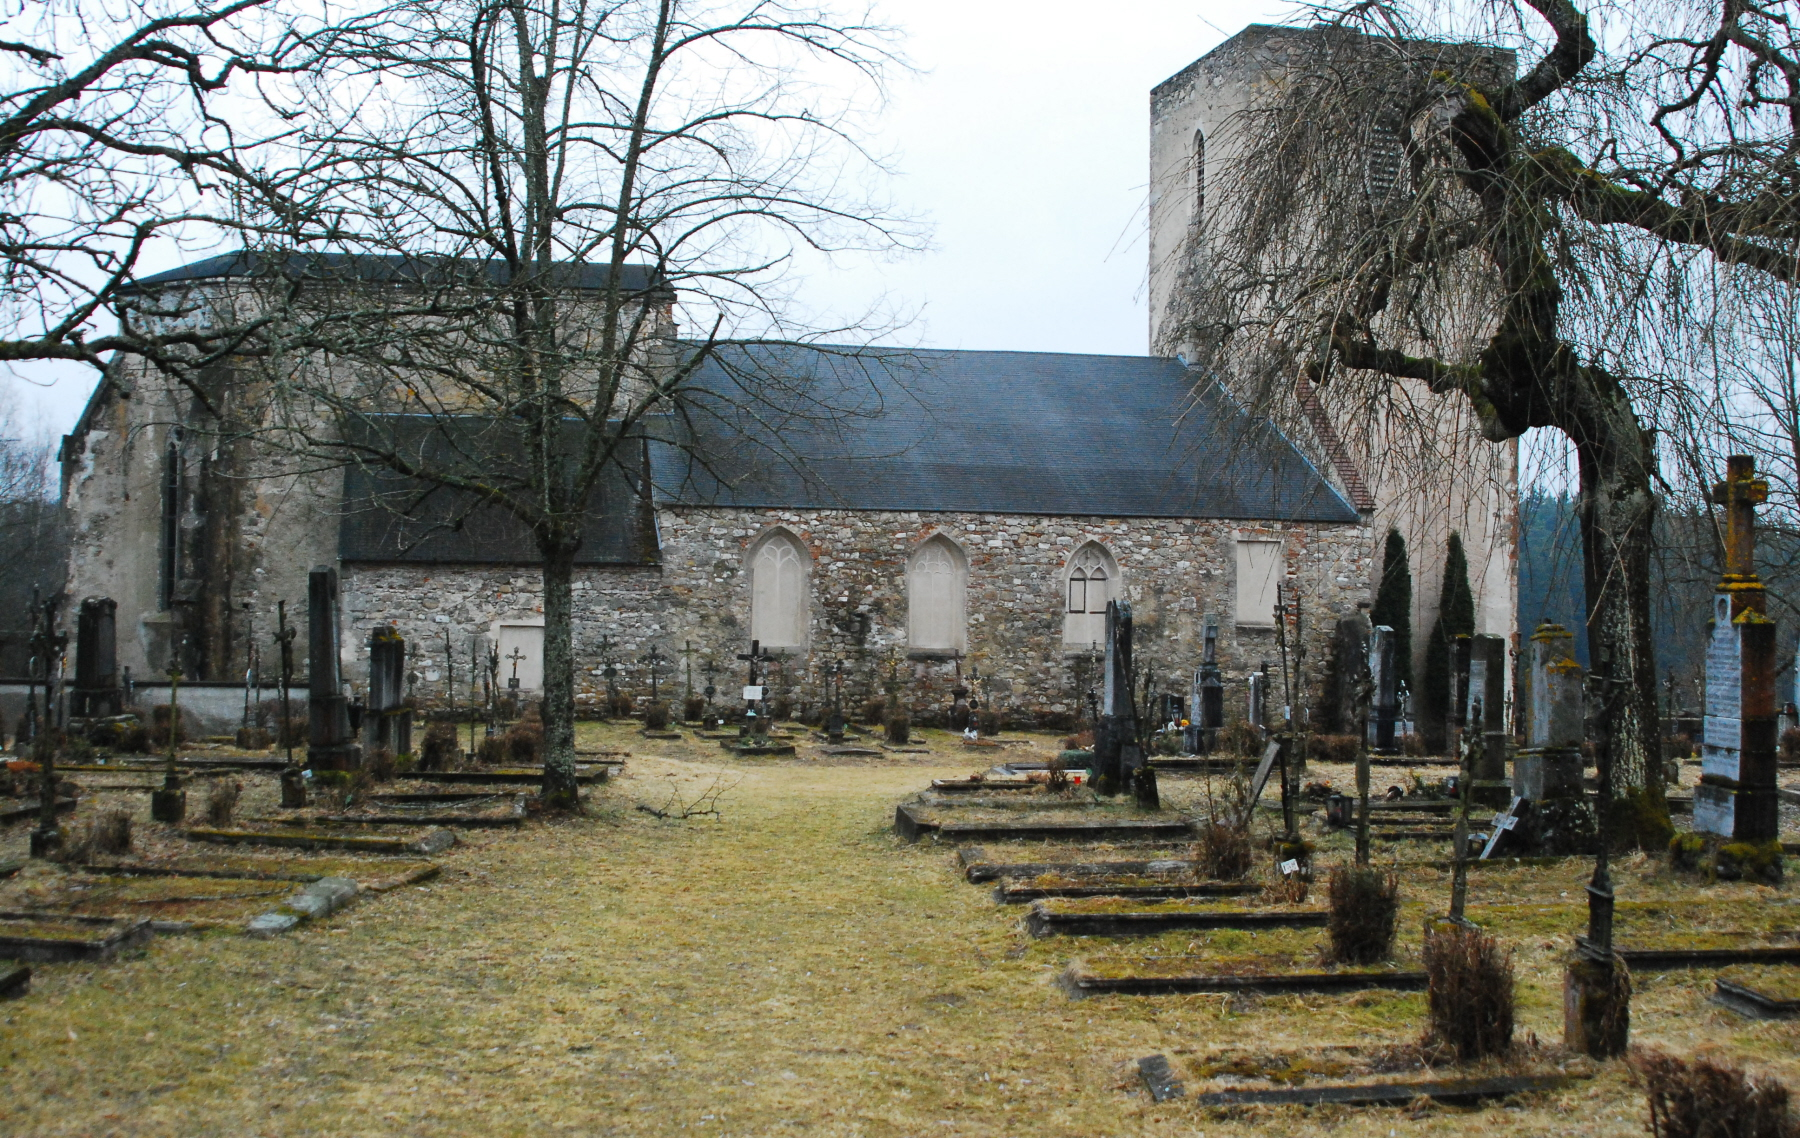 http://upload.wikimedia.org/wikipedia/commons/a/af/GuentherZ_2011-03-19_0082_Doellersheim_Ruine_Kirche_Friedhof.jpg